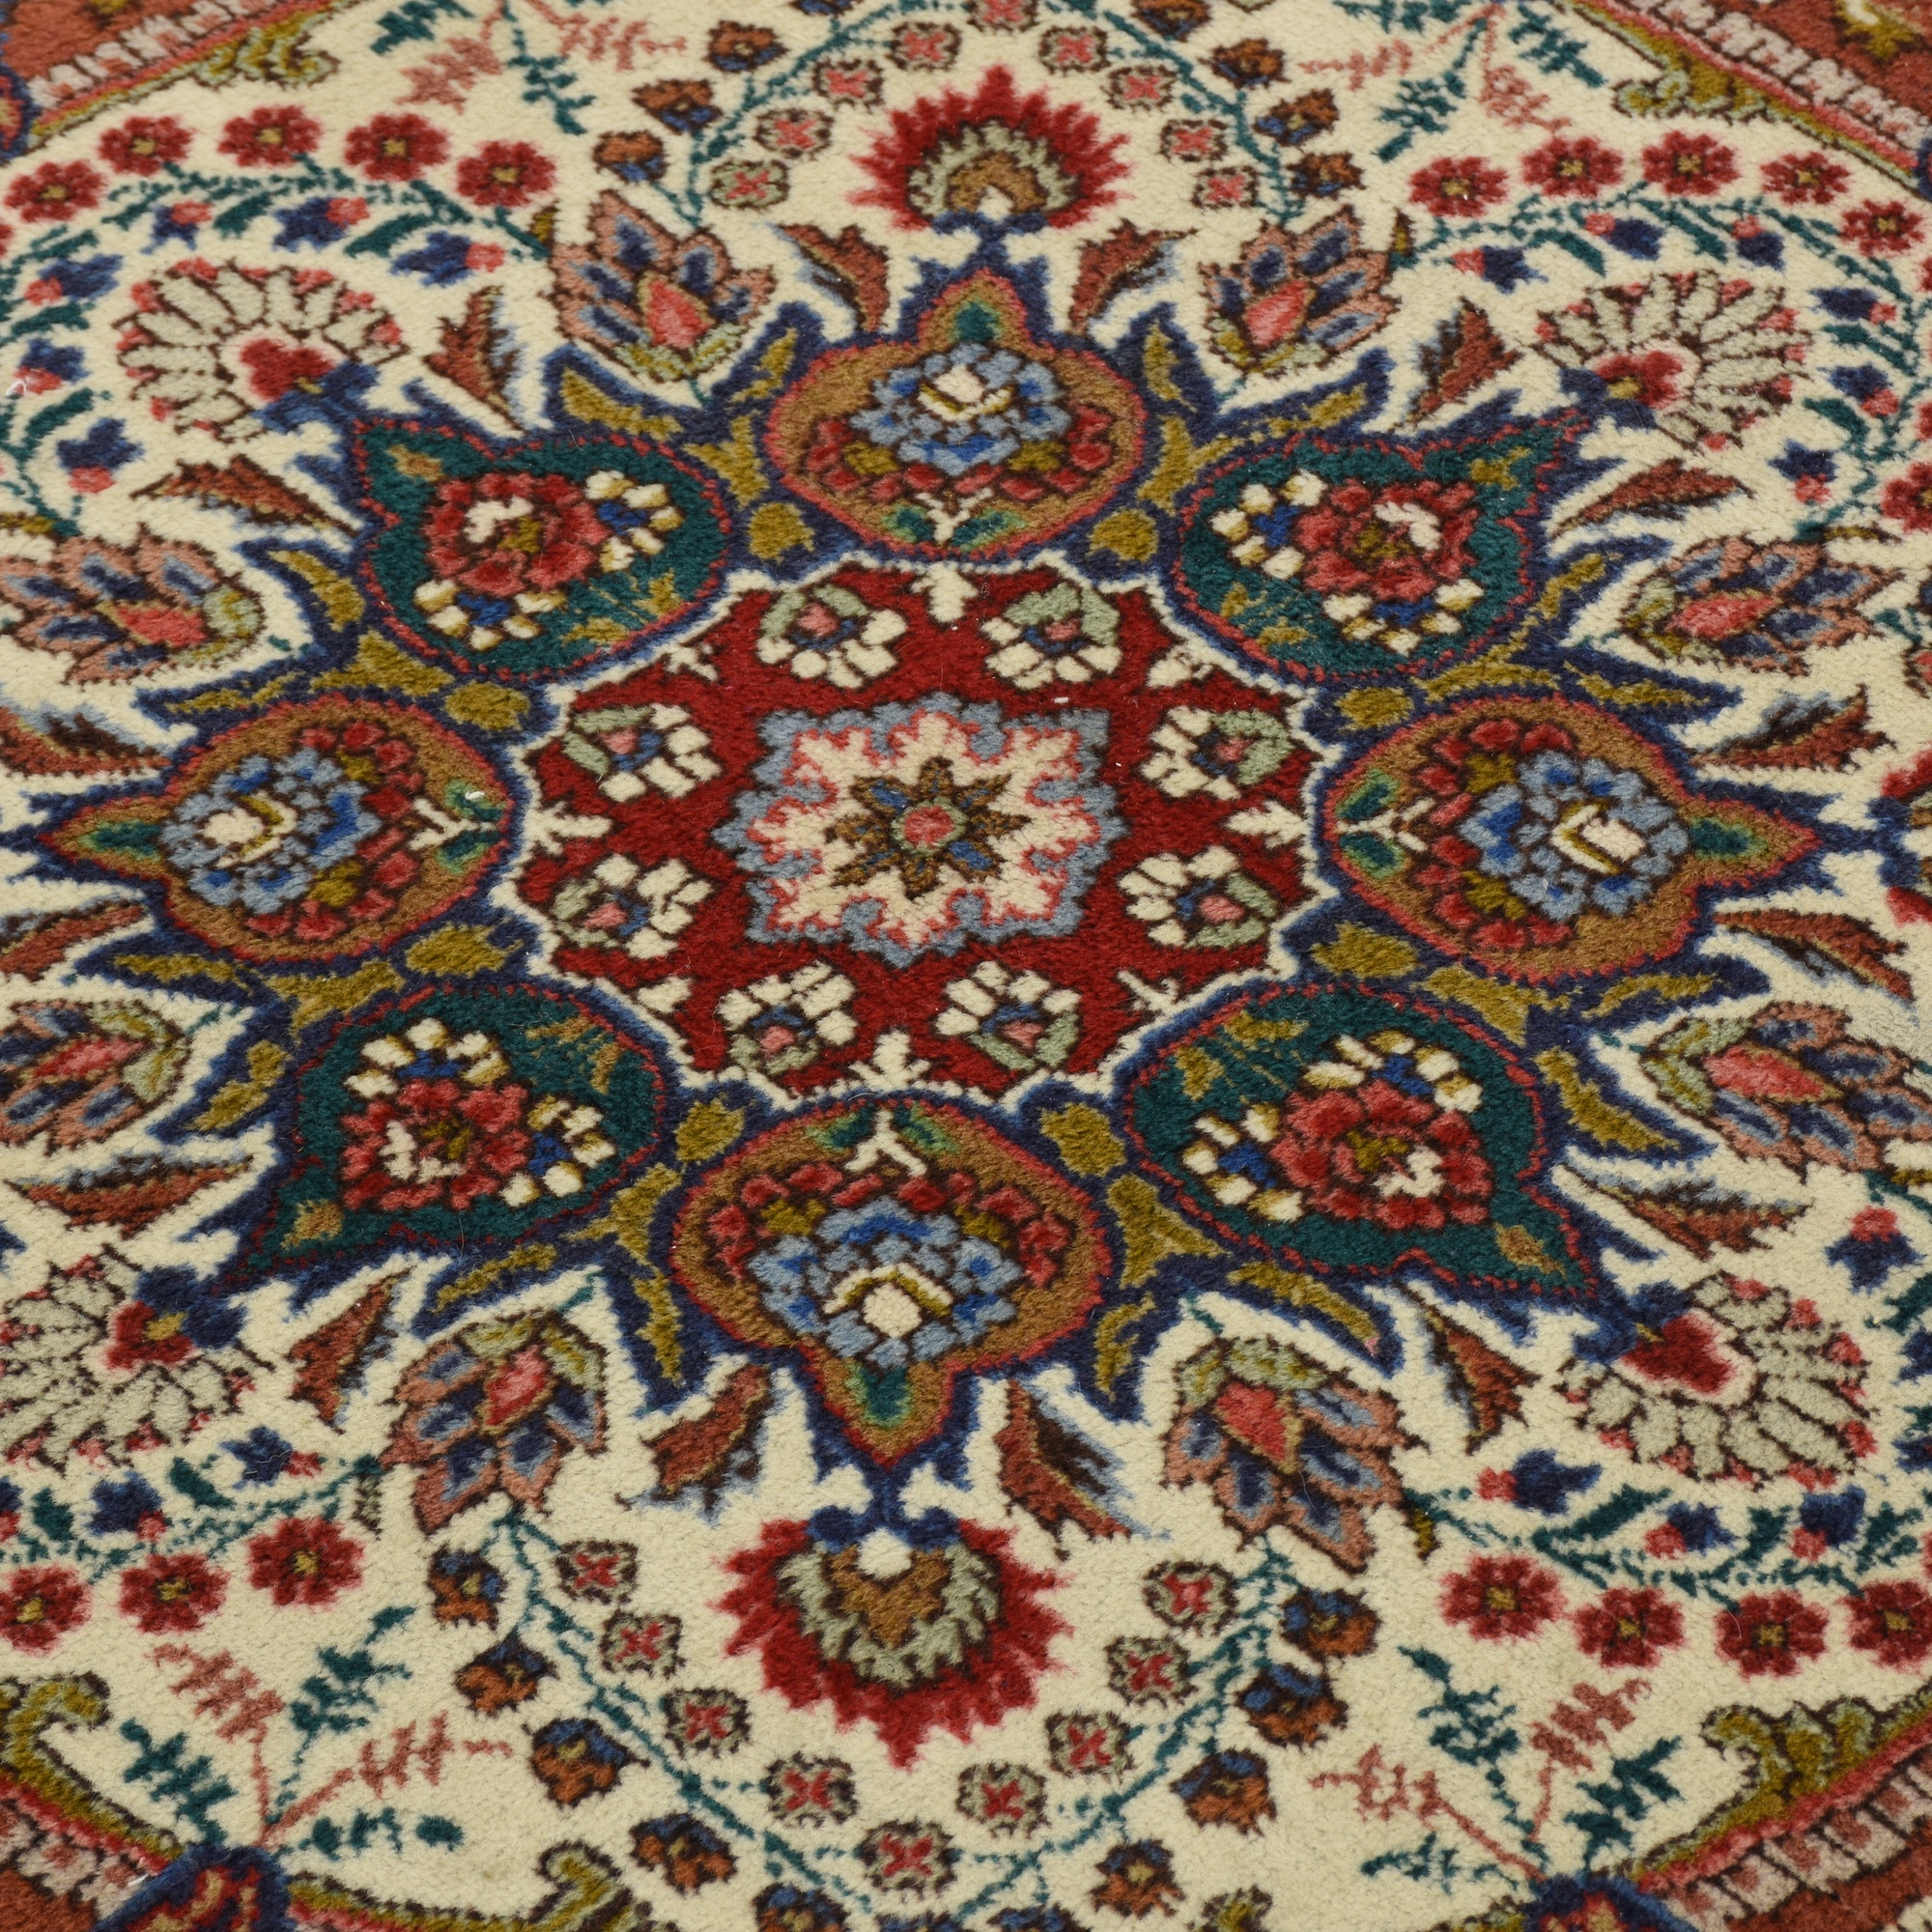 Persian Bohemian Round Fringe Floral Area Rug Loveseat